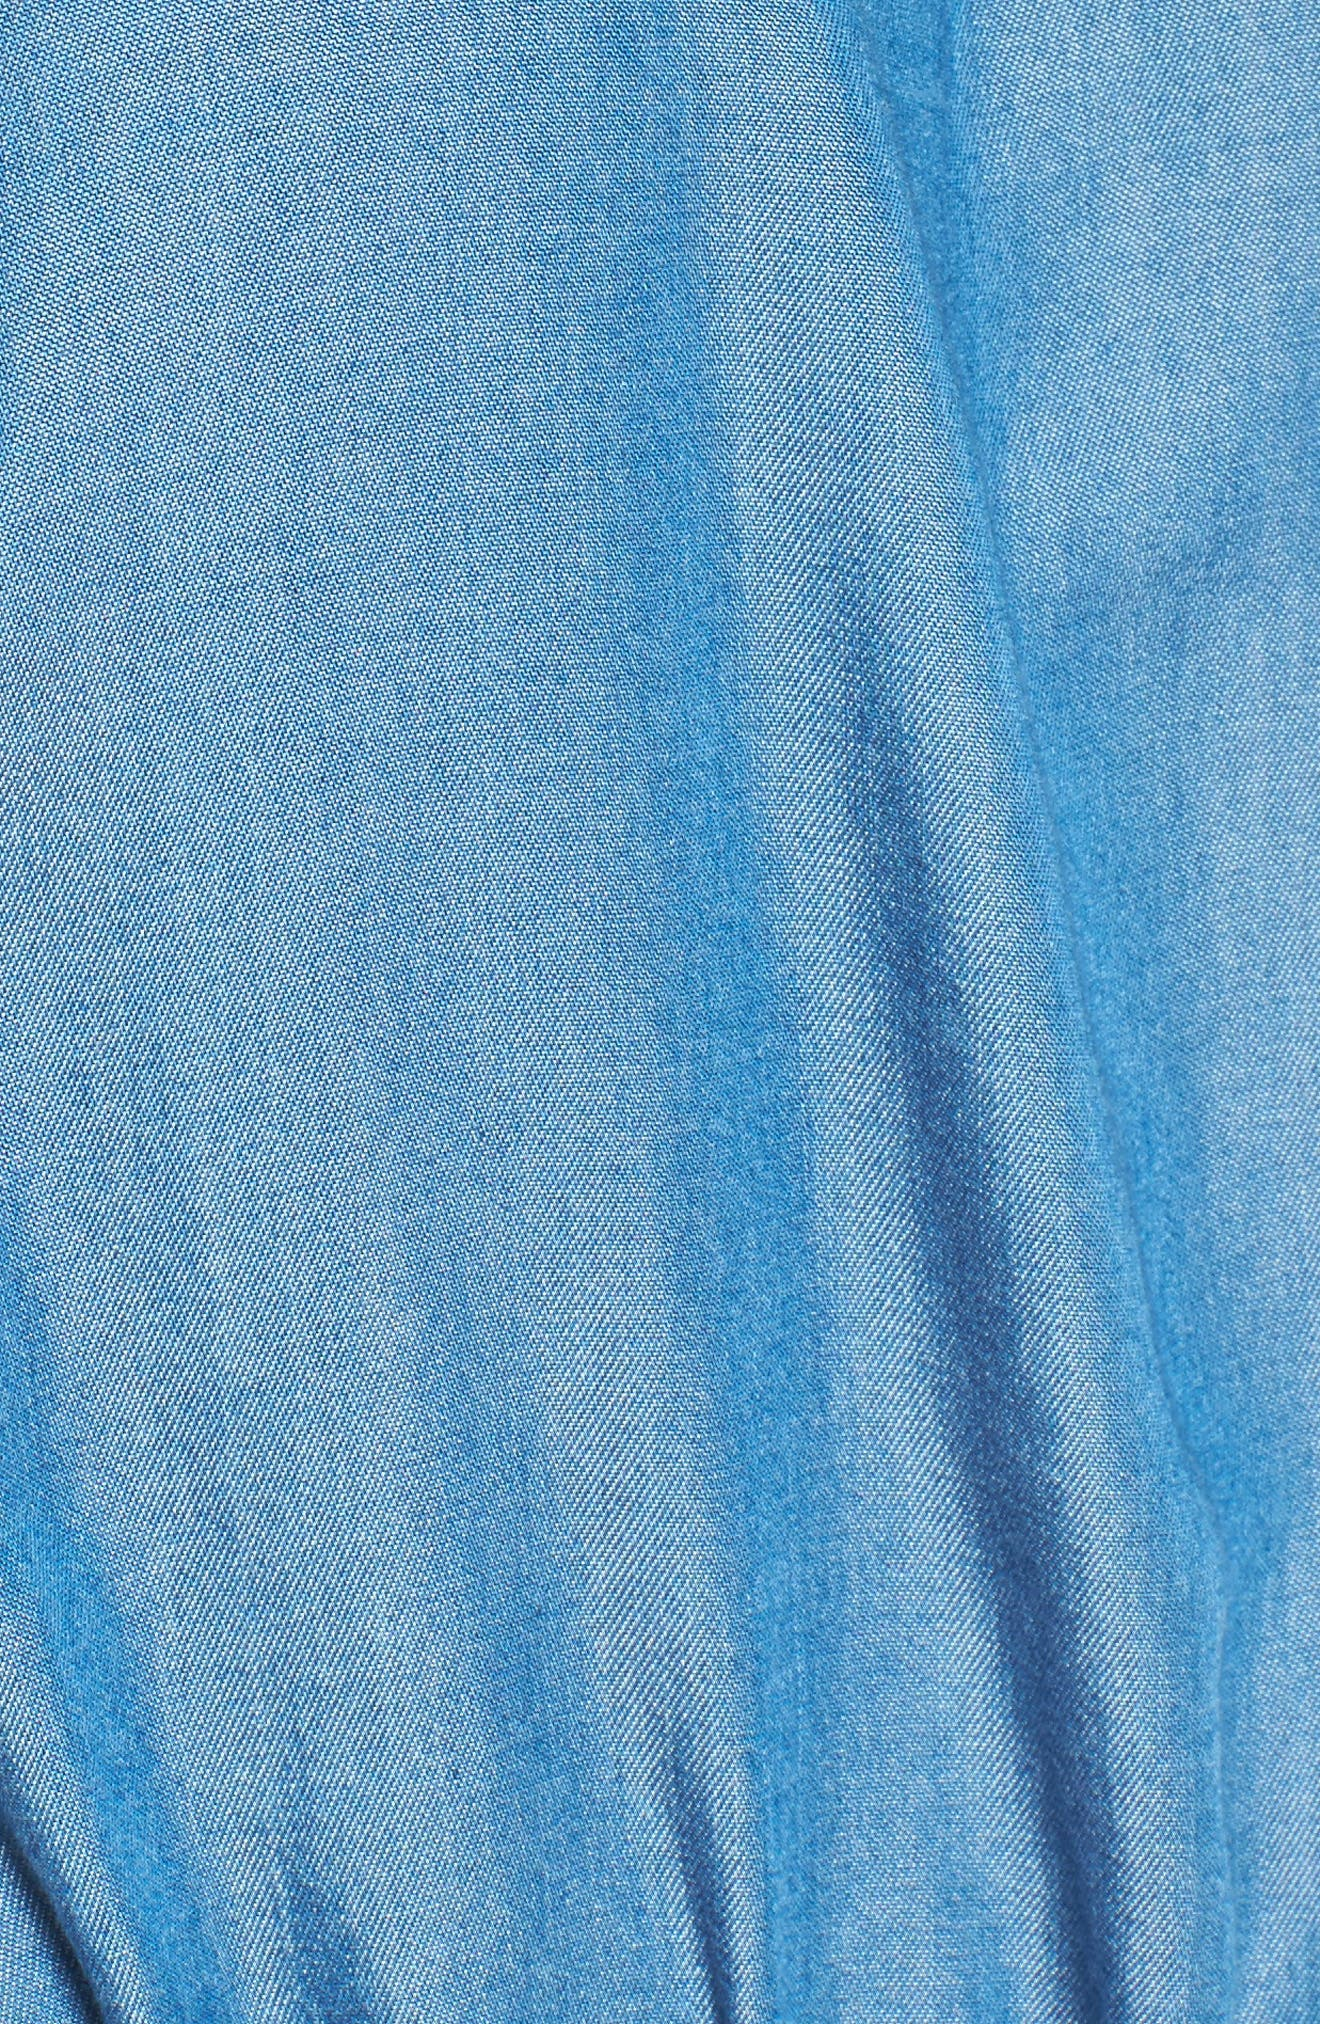 Cold Shoulder Chambray Romper,                             Alternate thumbnail 5, color,                             401